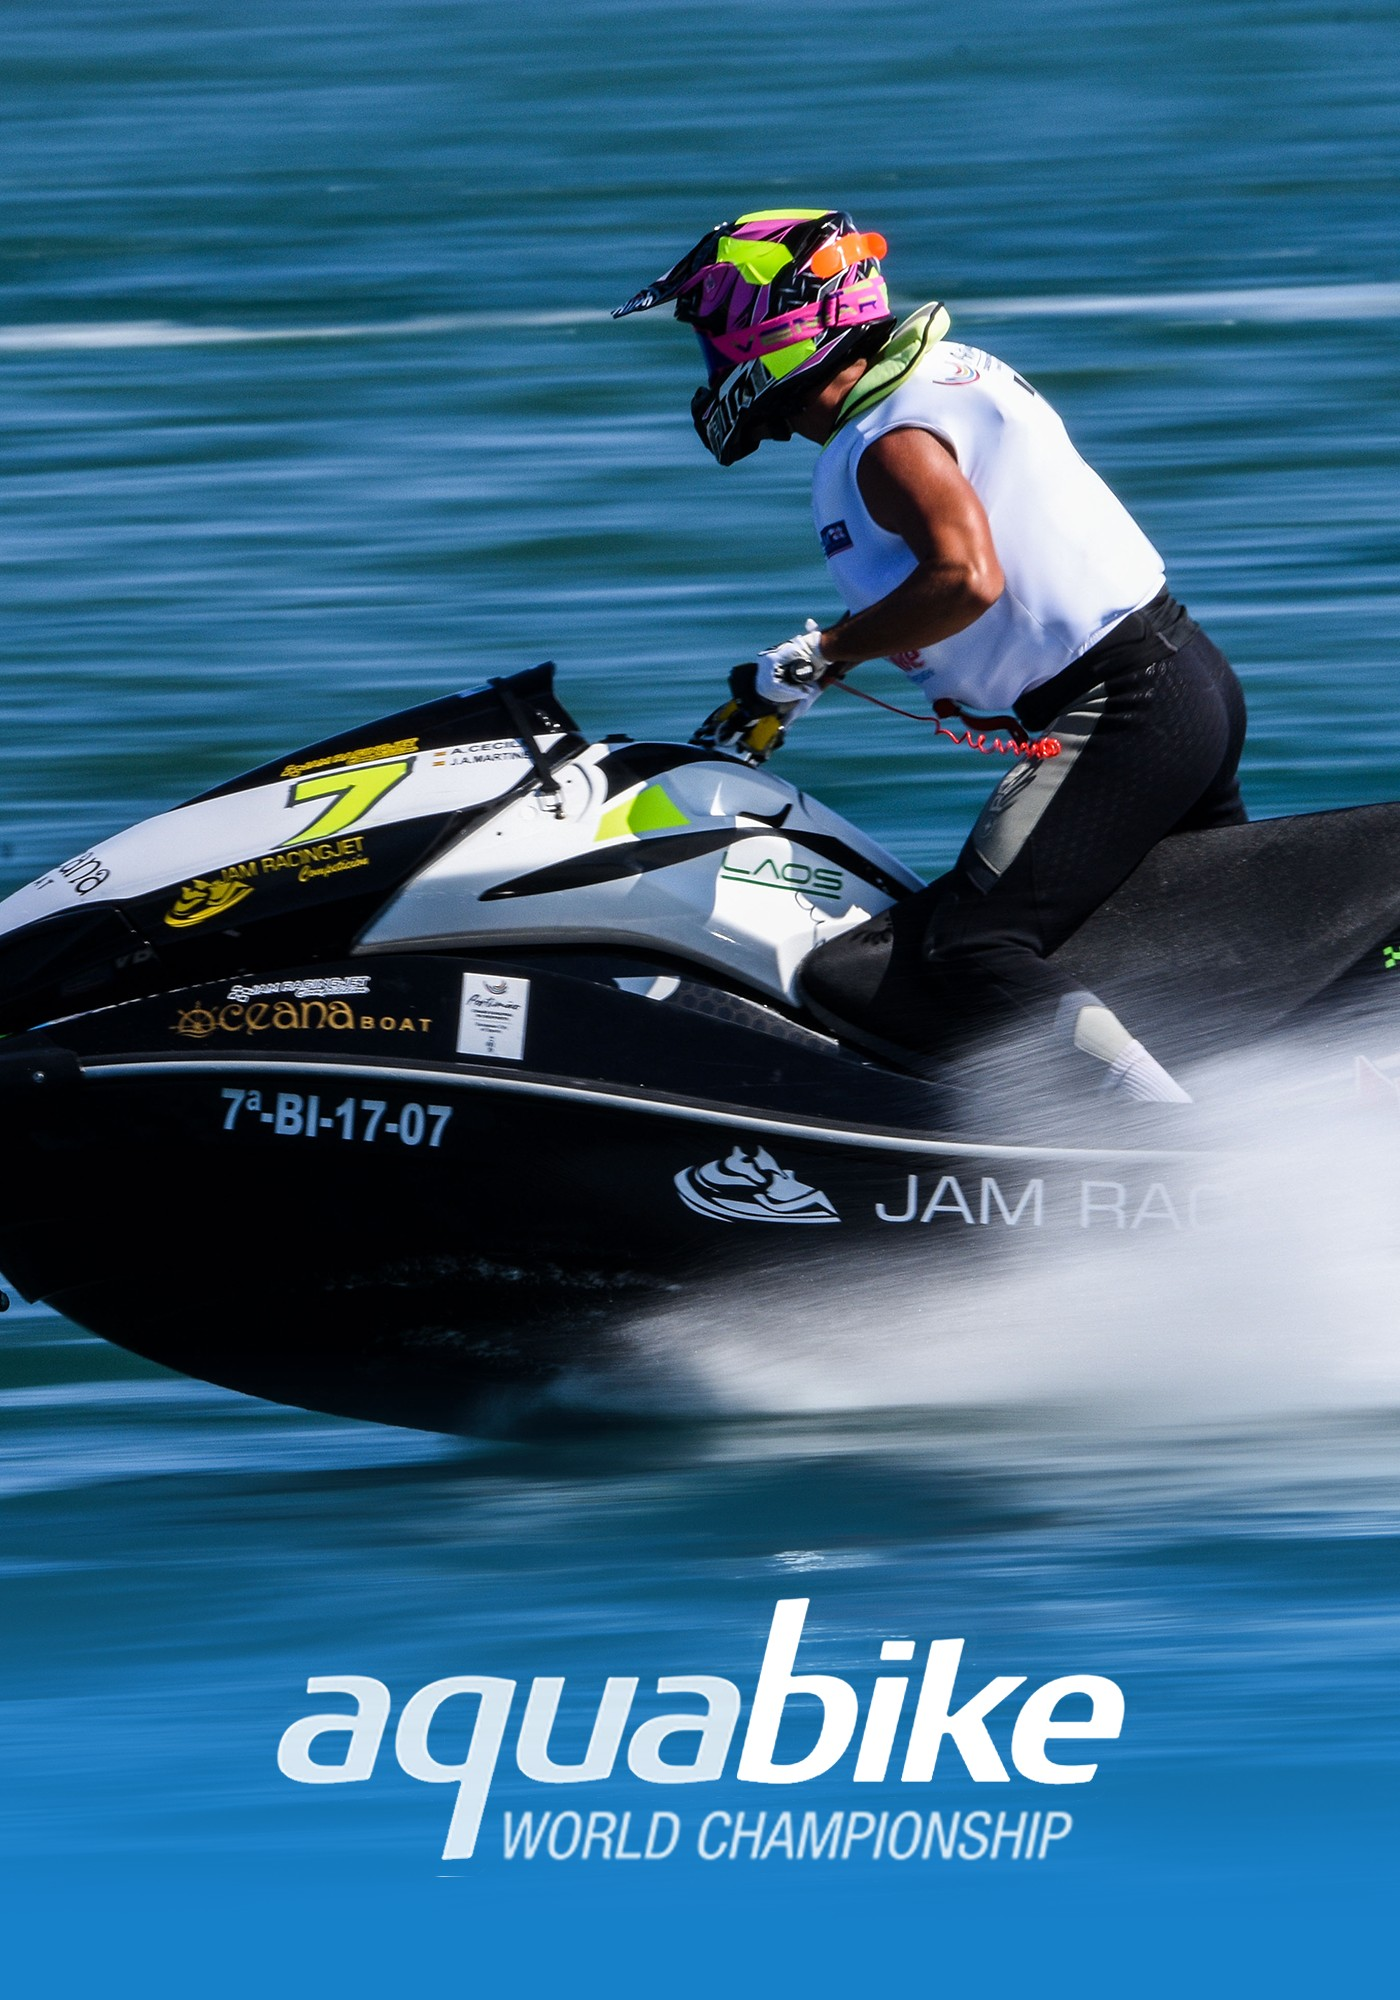 UIM ABP Aquabike World Championship